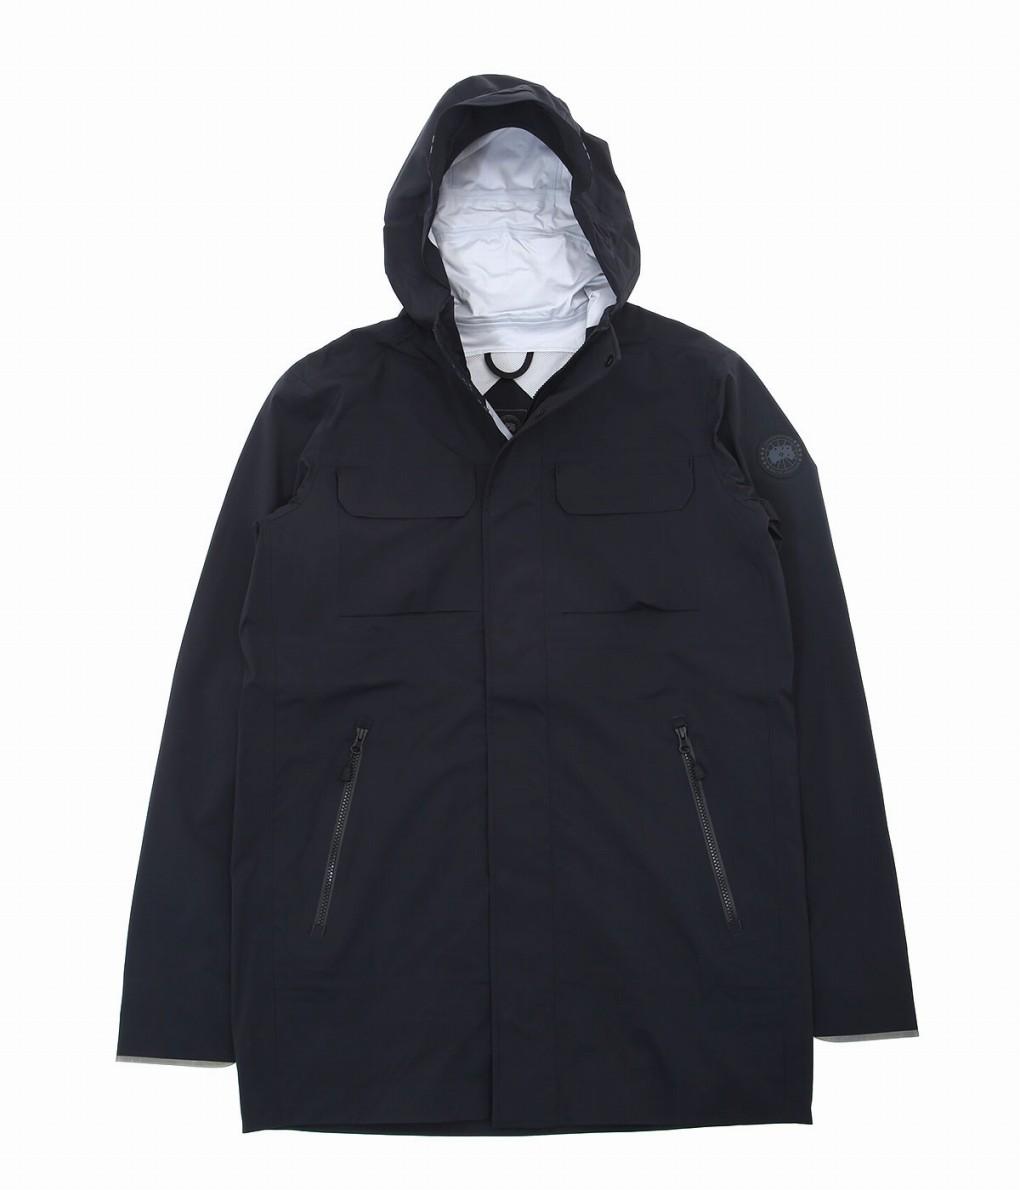 colours and striking purchase original how to get CANADA GOOSE / Canada goose: WASCANA JACKET BLACK LABEL: Jacket outer men  black label men: 5,612MB